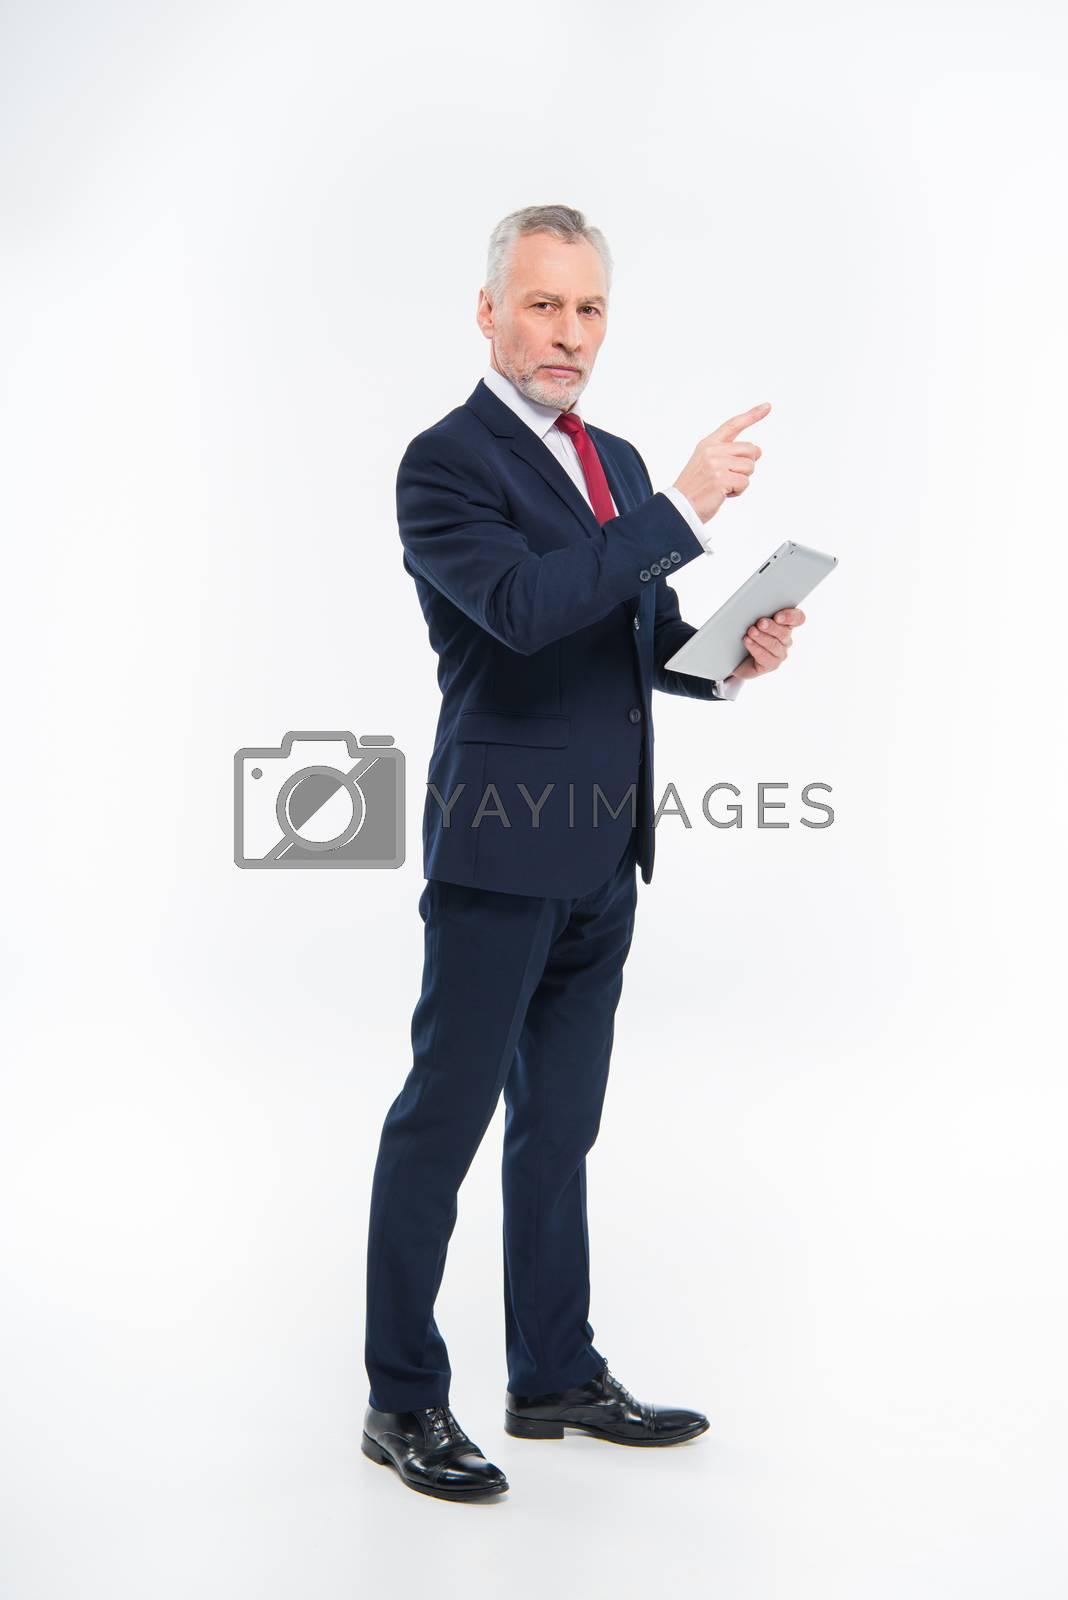 Royalty free image of Businessman holding digital tablet by LightFieldStudios